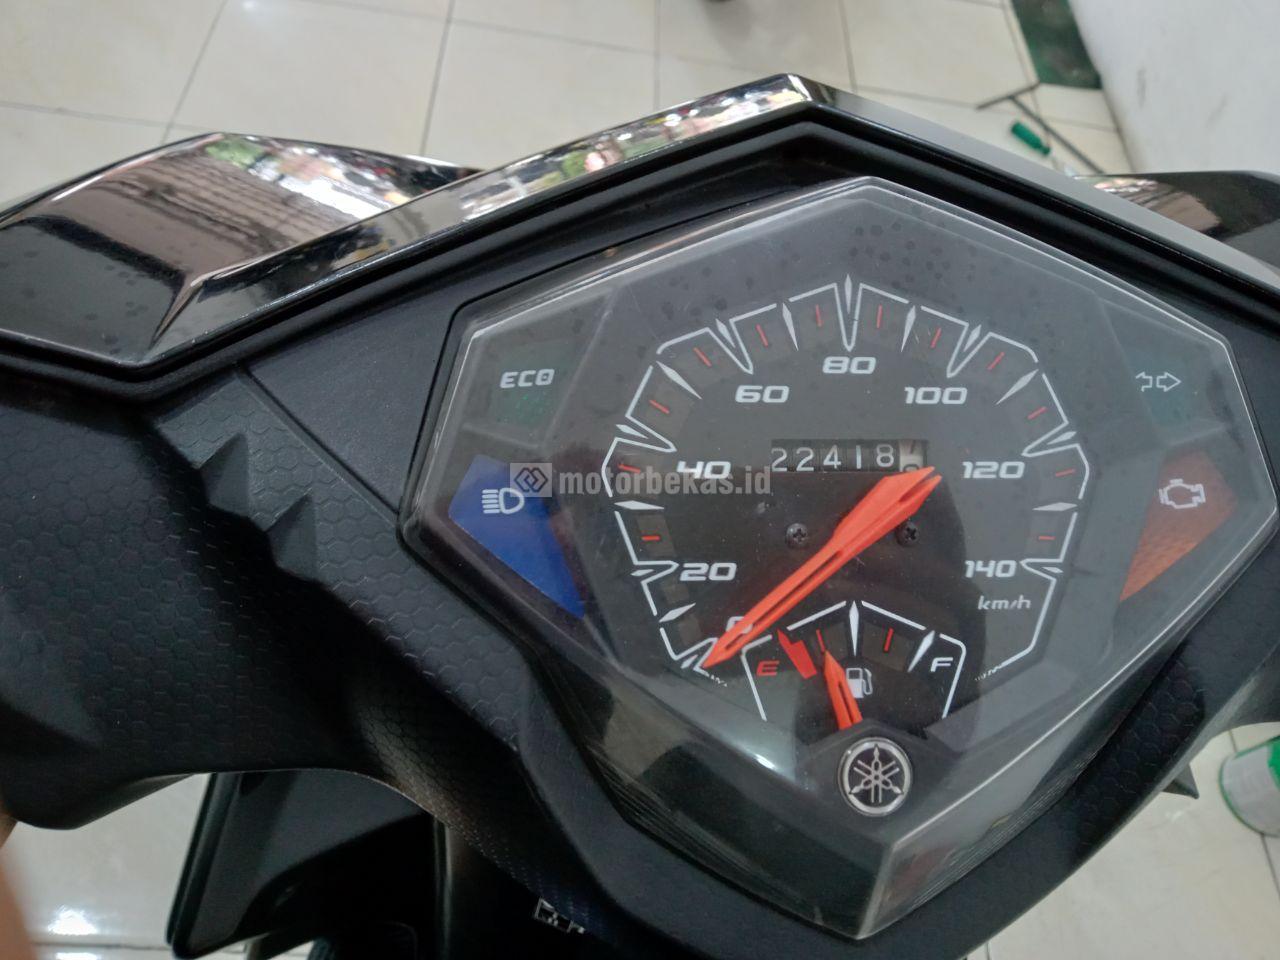 YAMAHA MIO M3 125 FI 2657 motorbekas.id